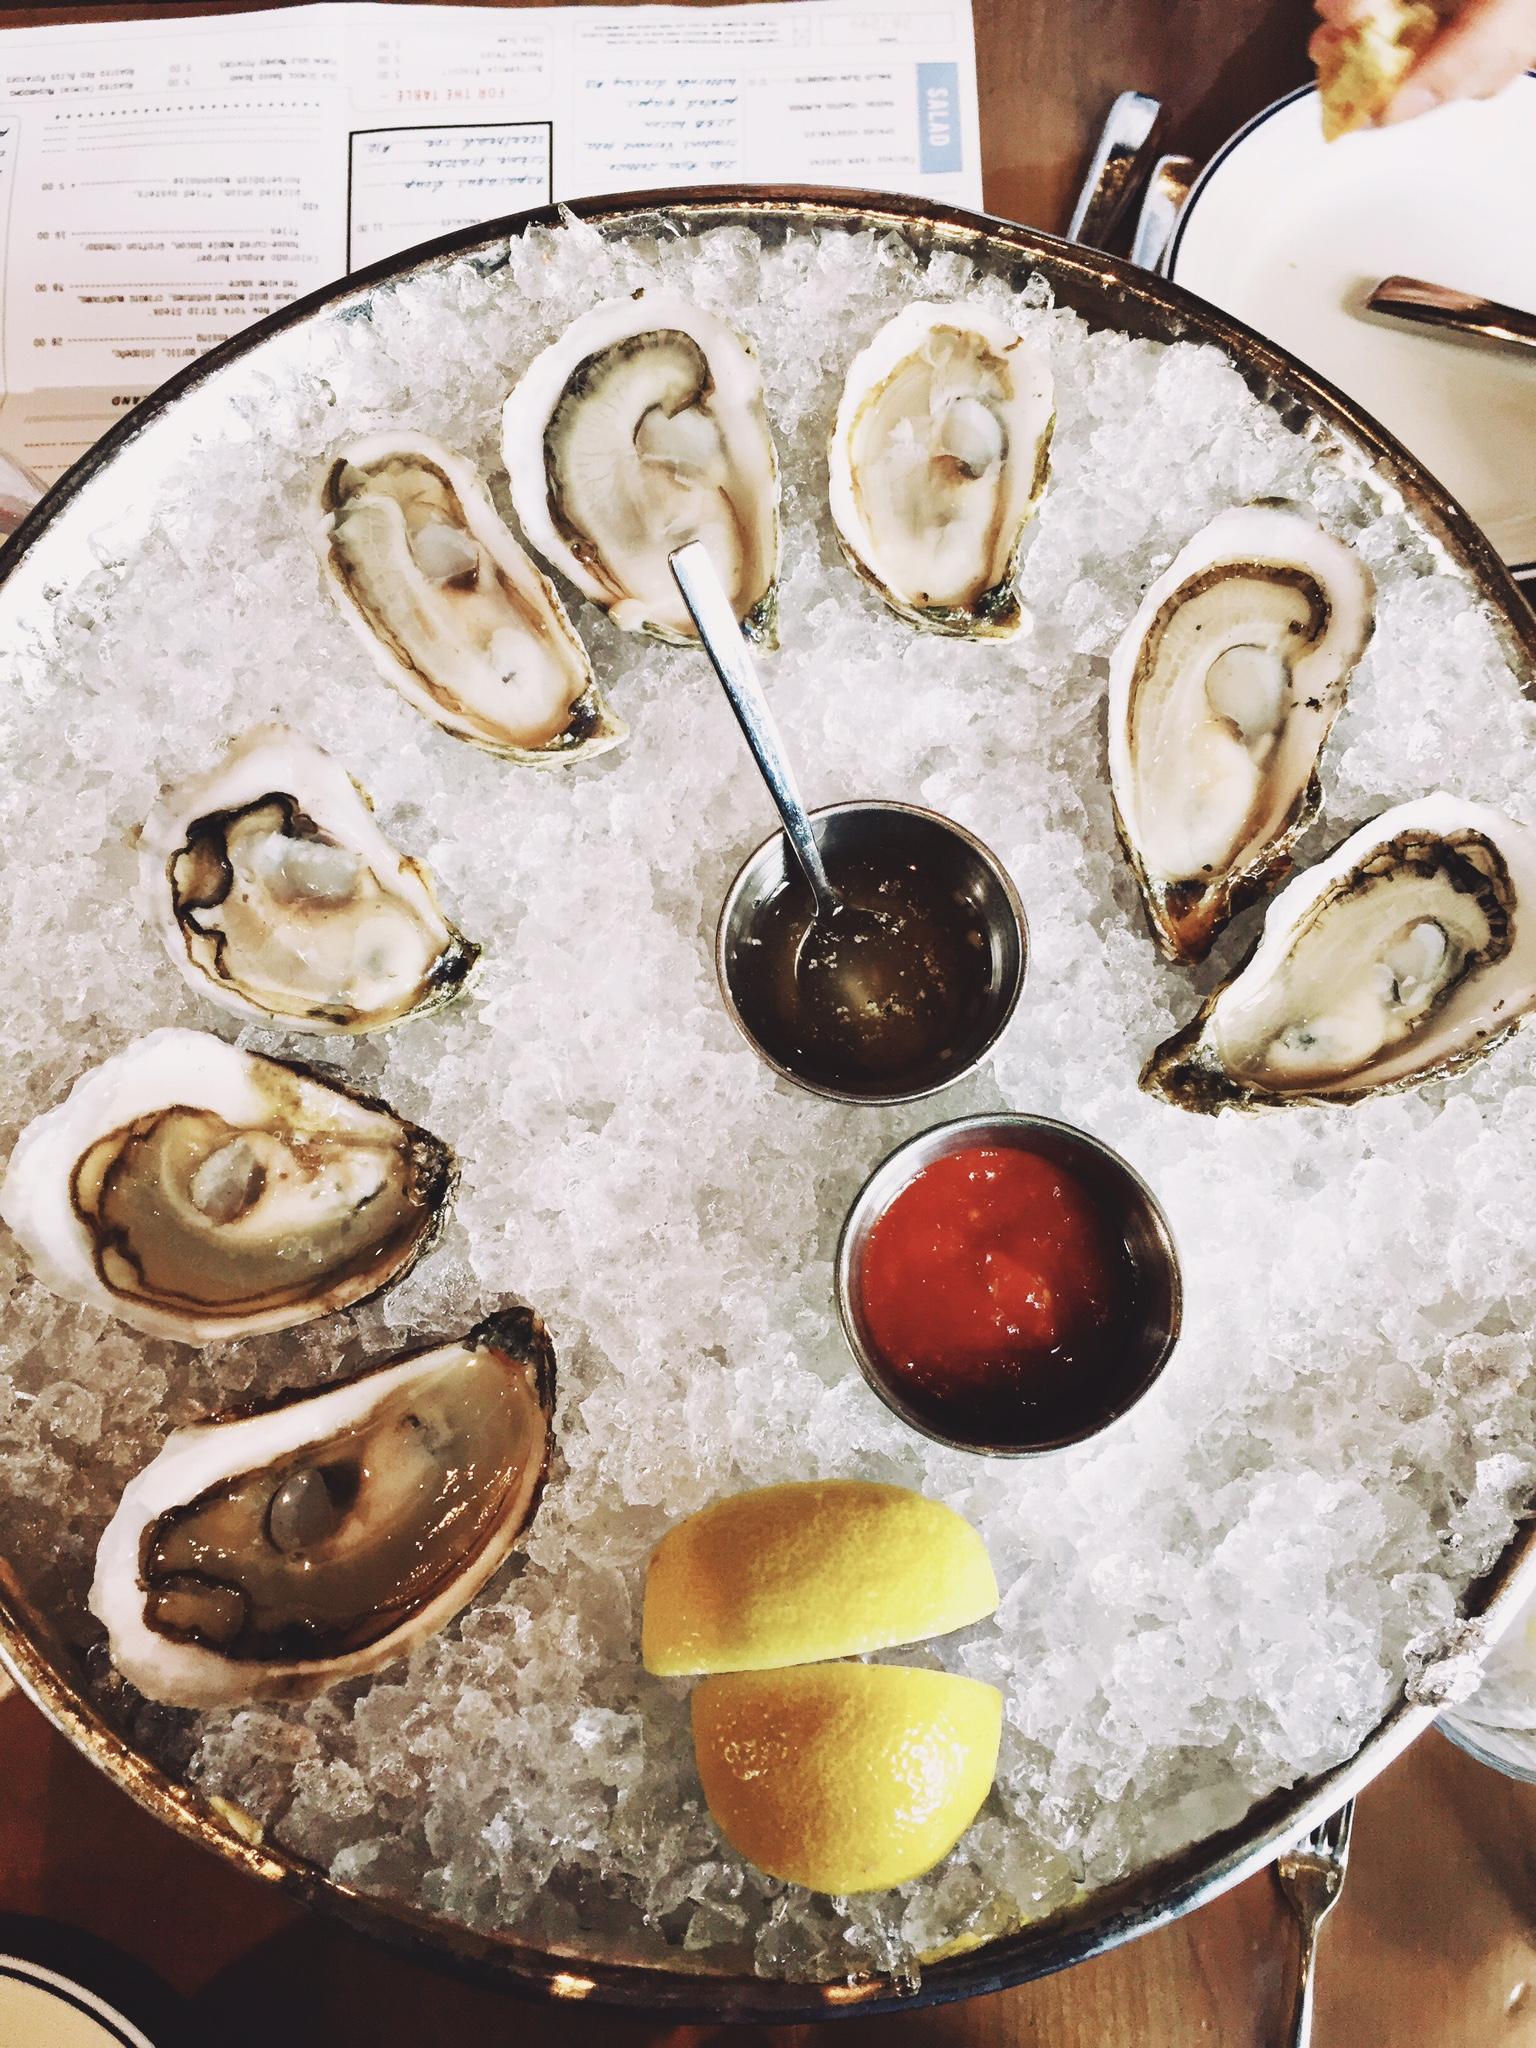 Oysters at Island Creek Oyster Bar - Boston